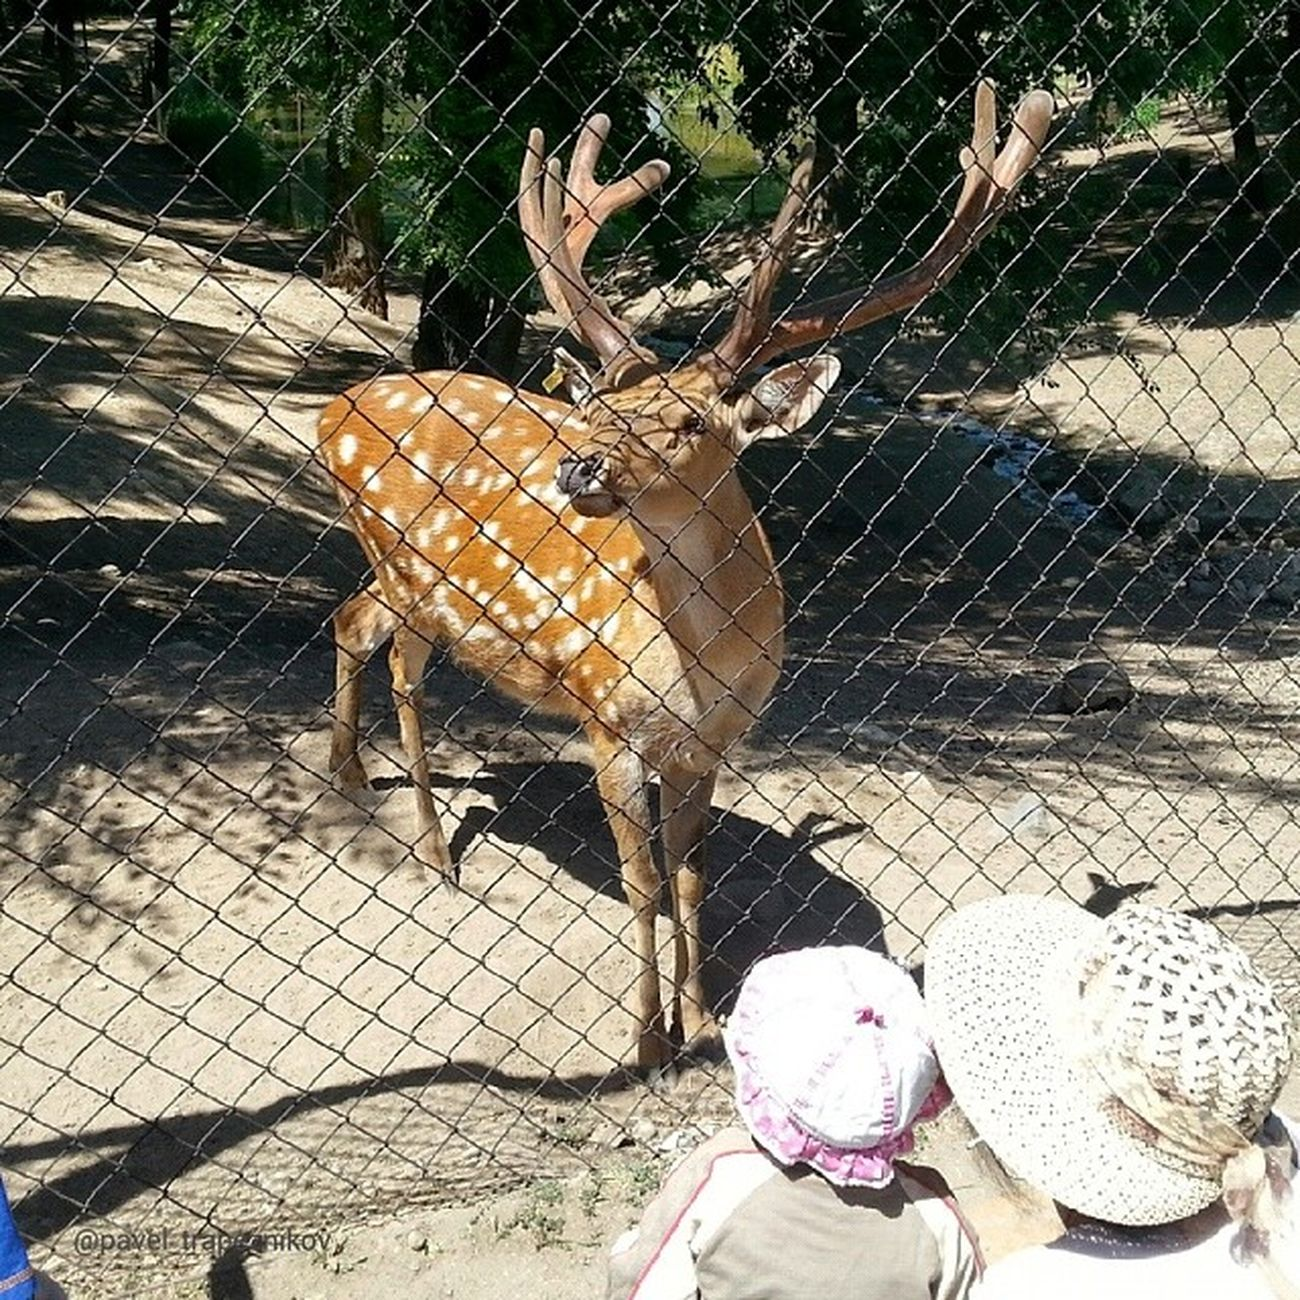 20140730 , Казахстан , алматы . Алматинский зоопарк . Пятнистый олень/ Kazakhstan, Almaty. Almaty Zoo. Sika deer.